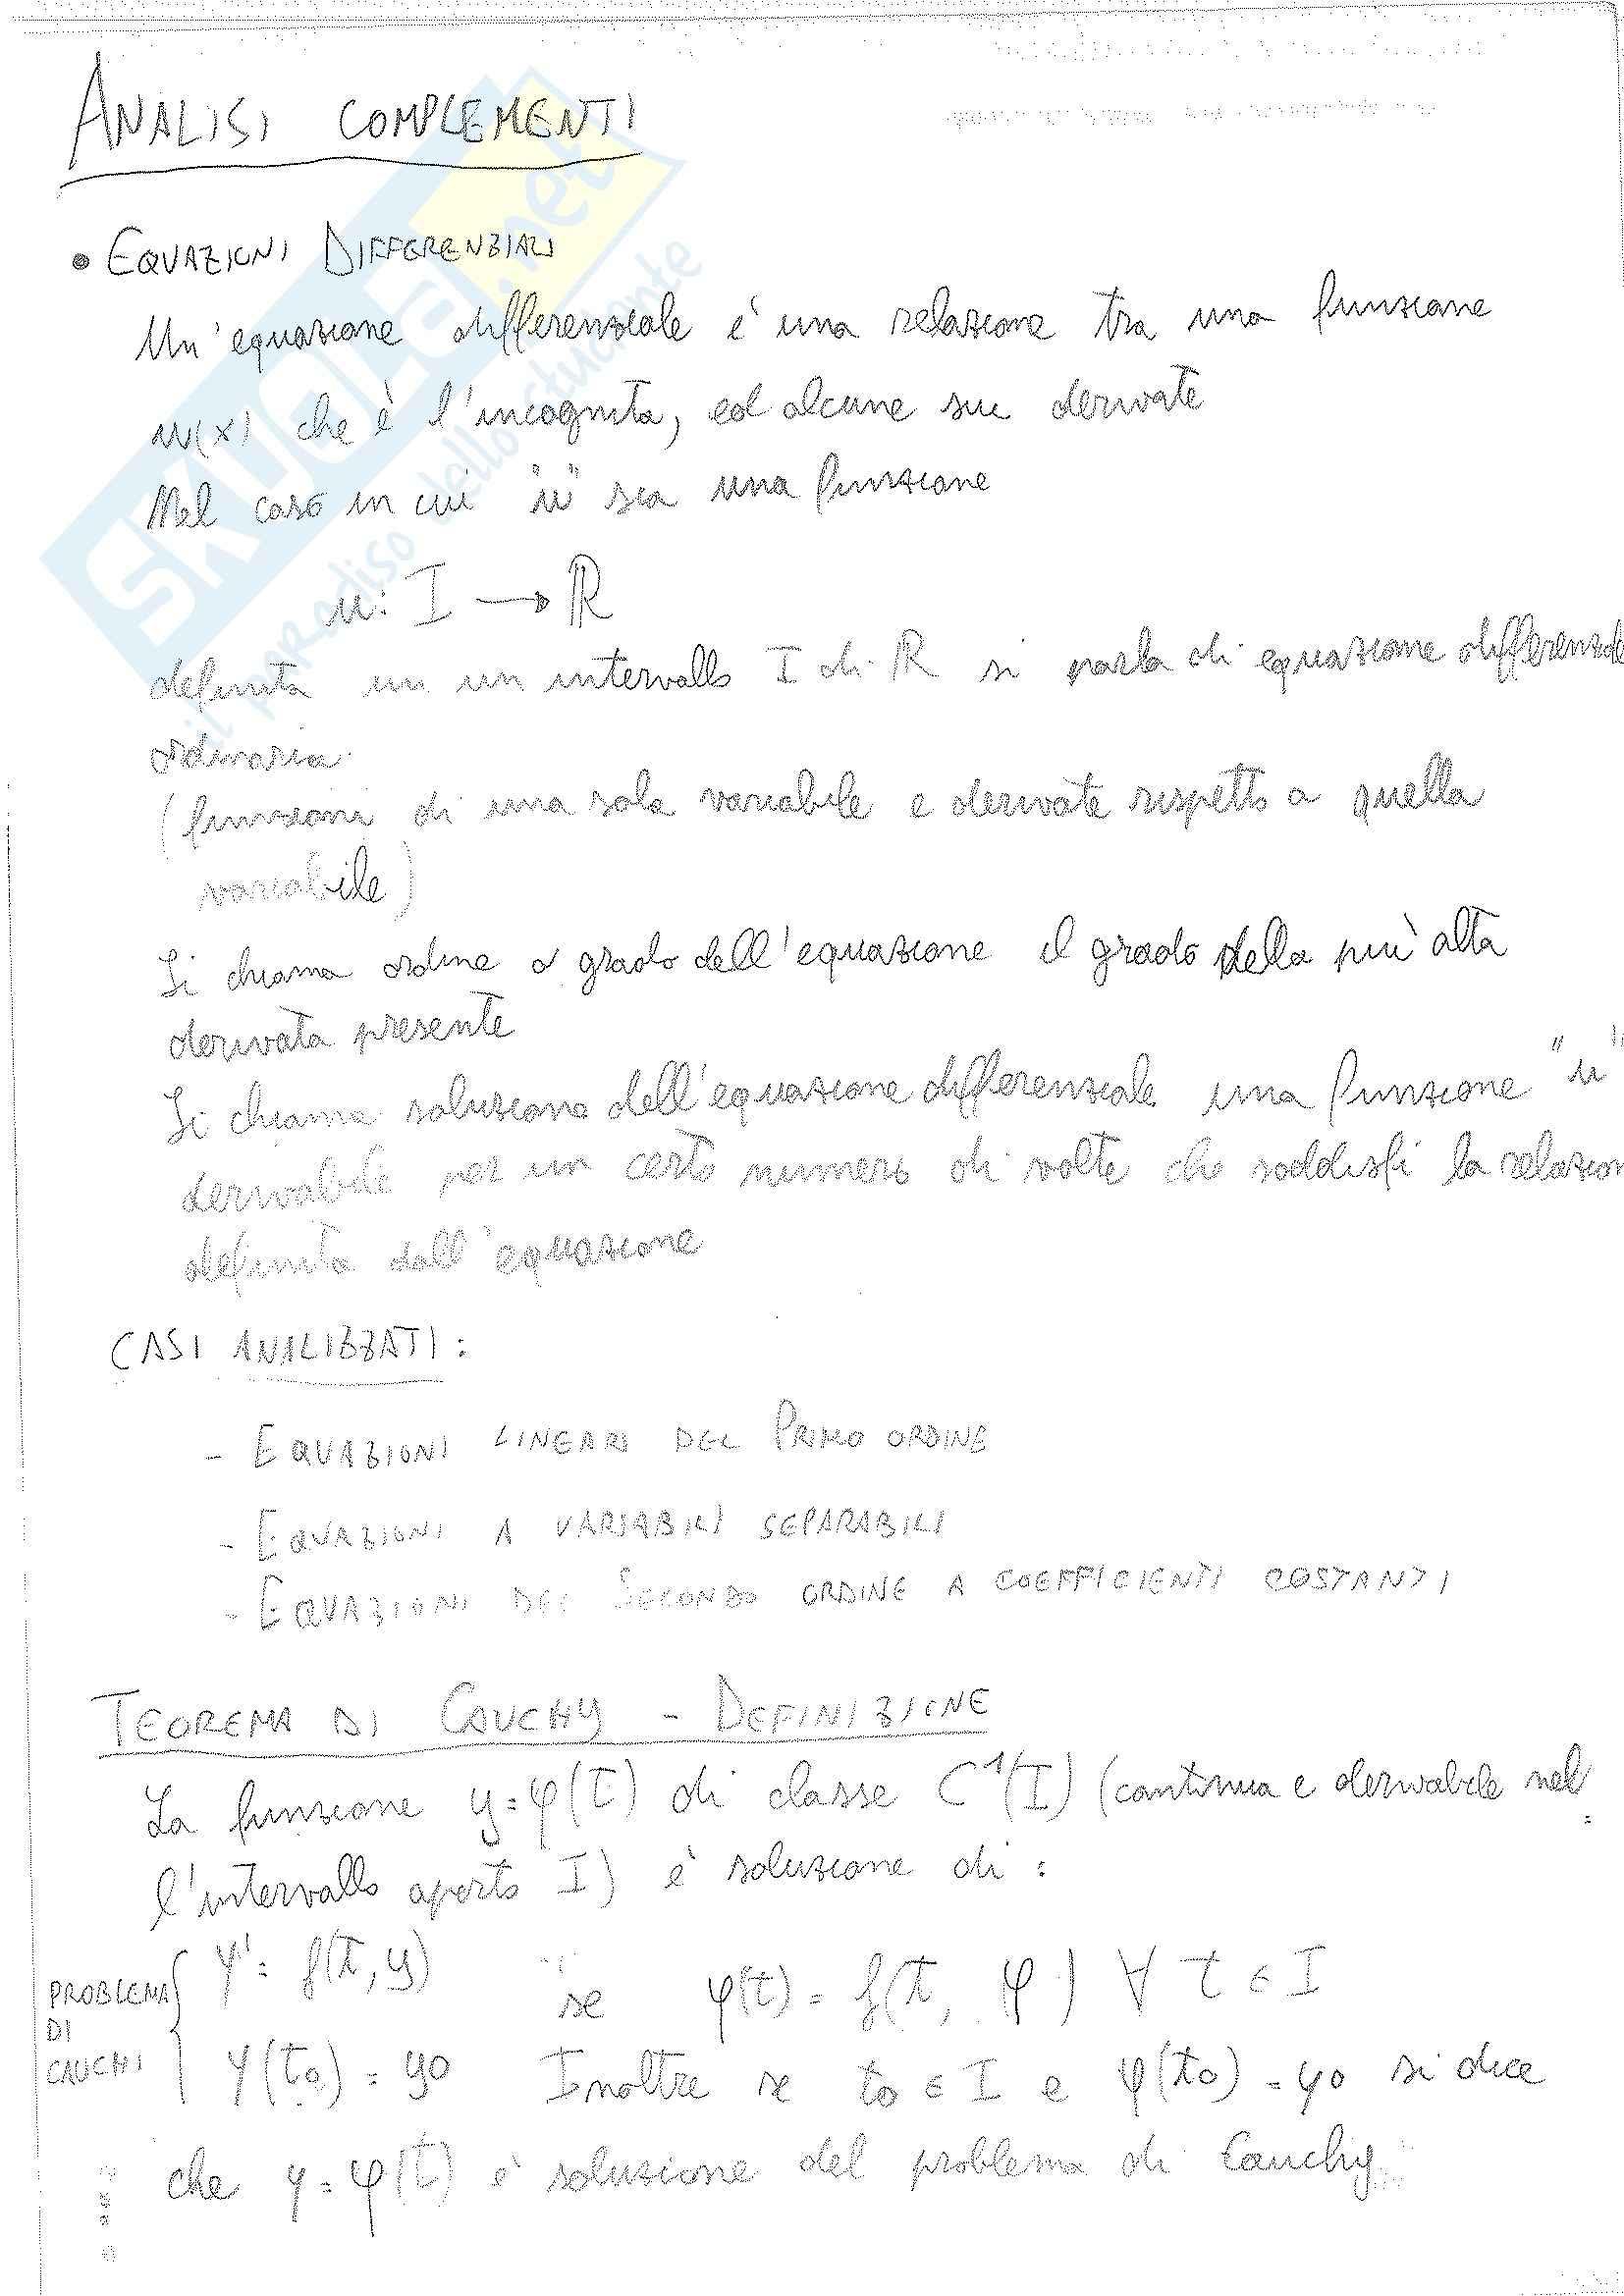 Analisi matematica - Complementi